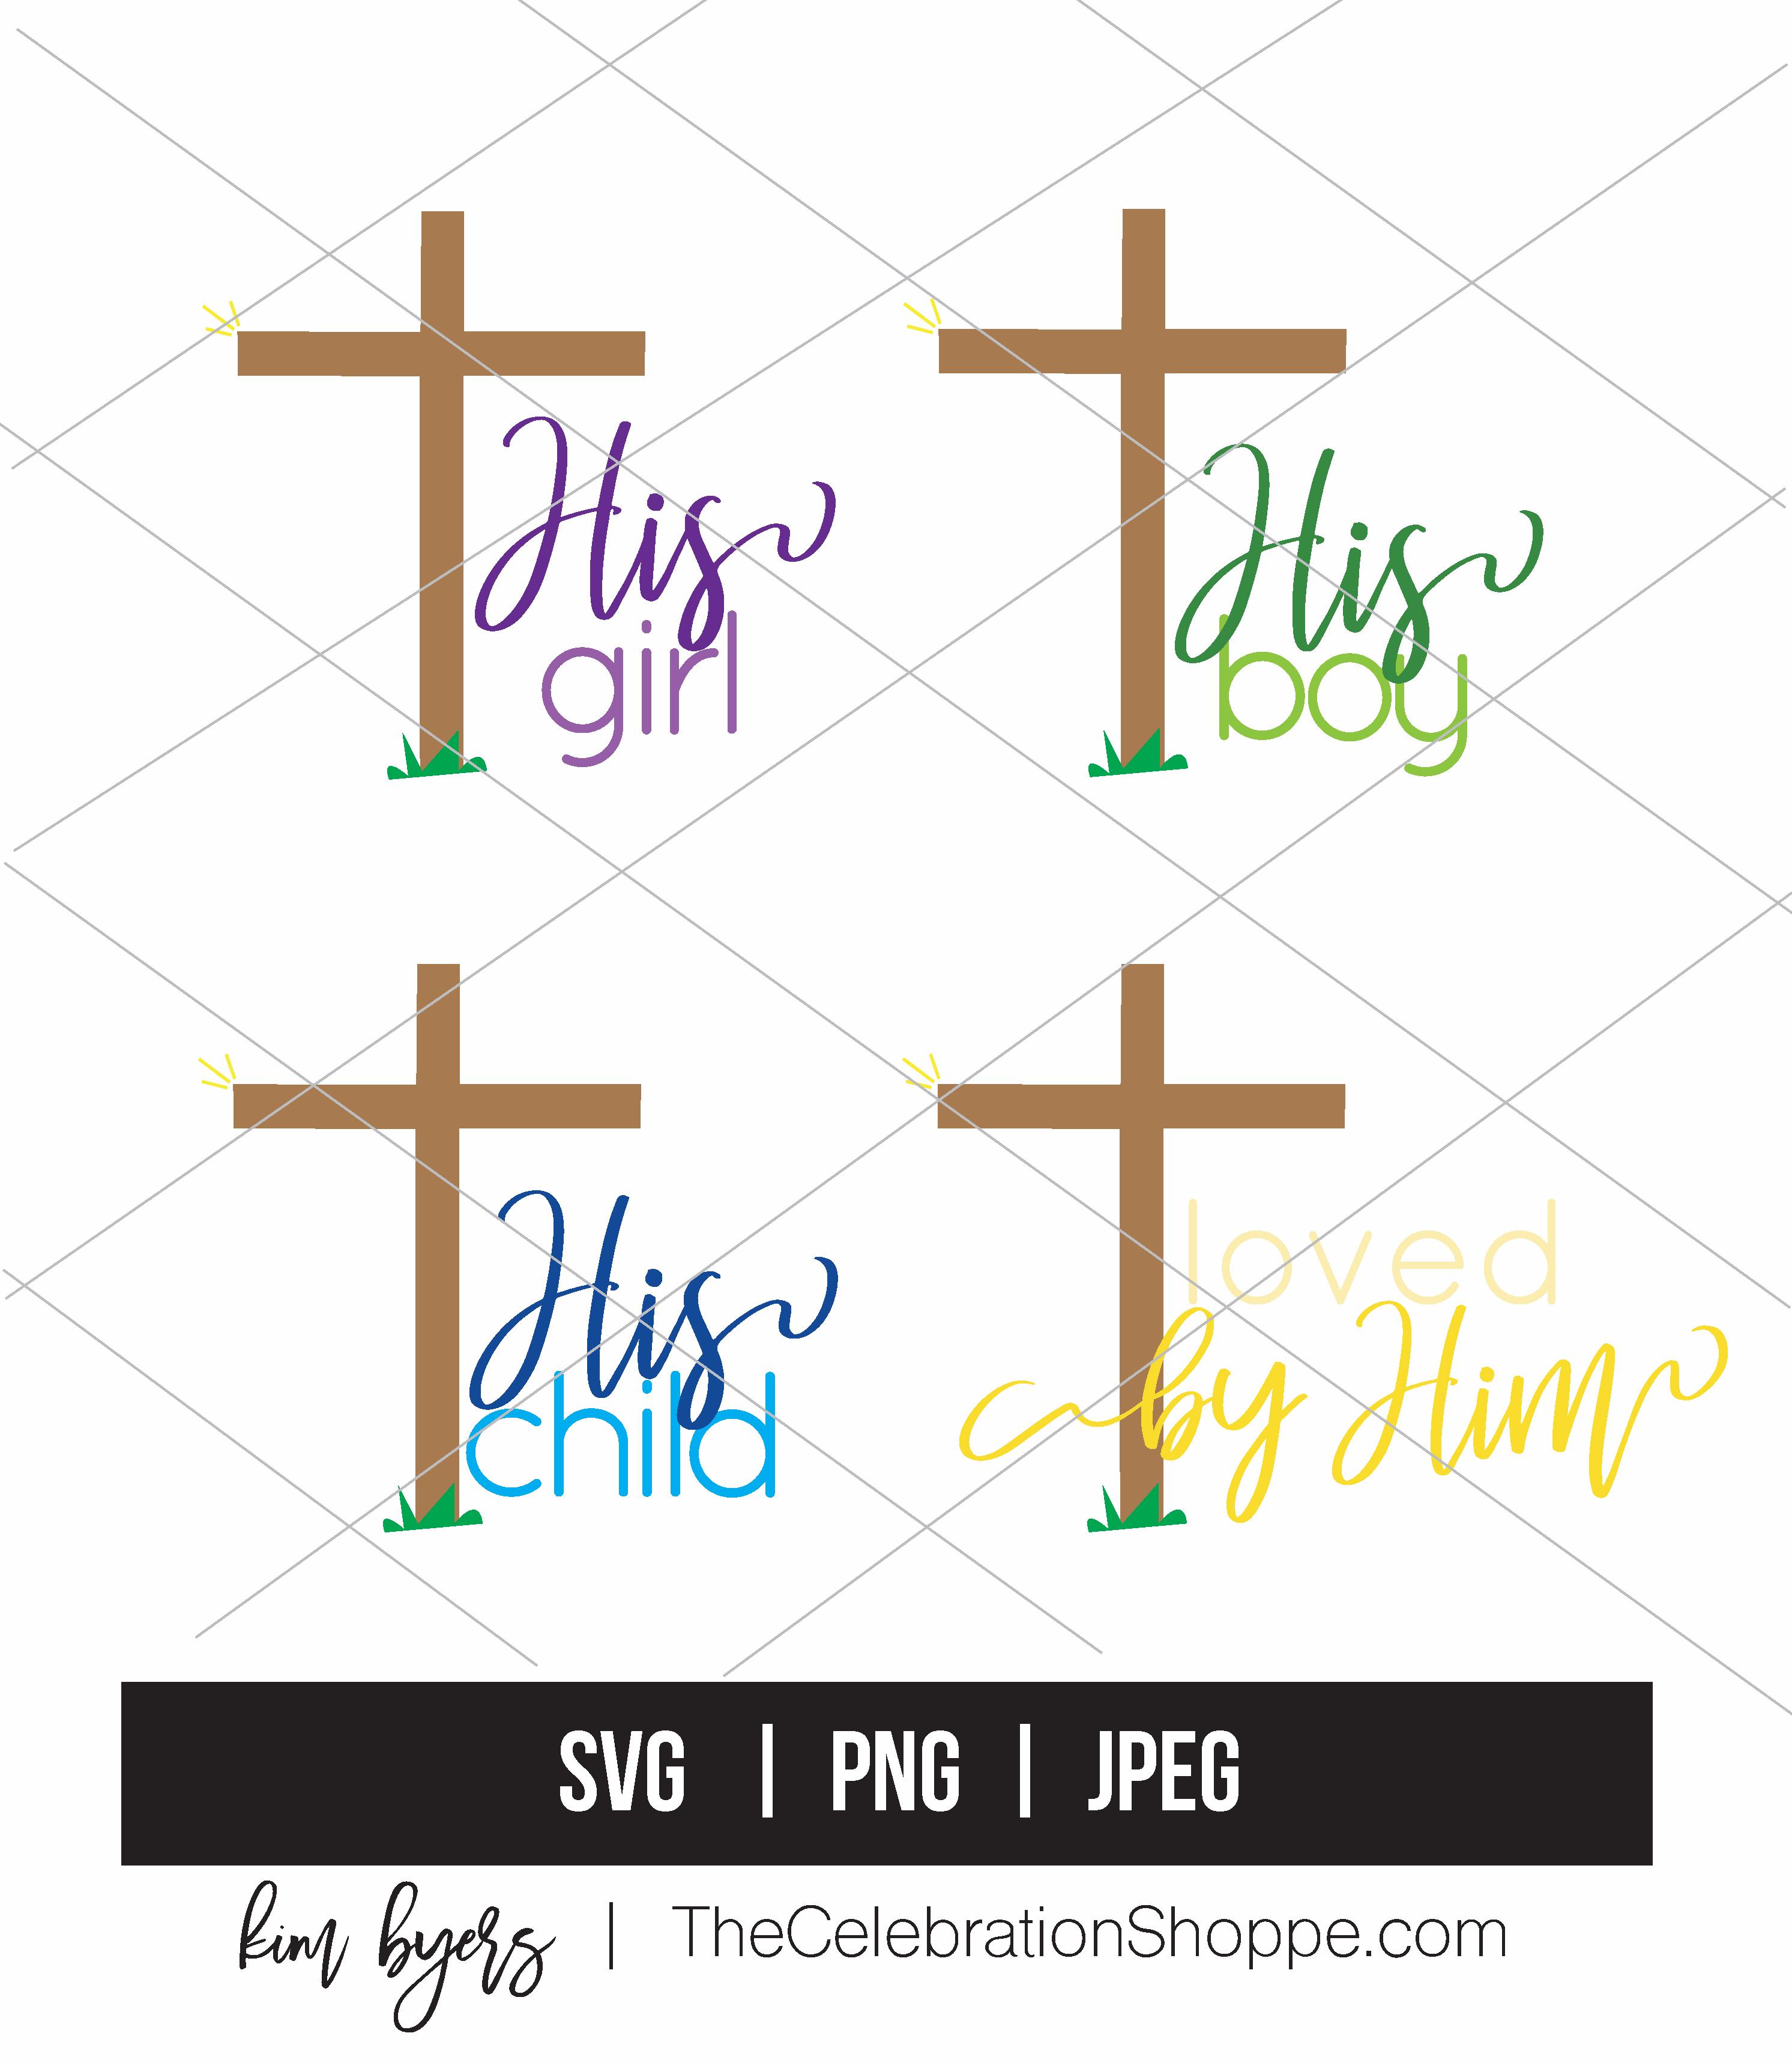 Christian SVG Bundle | Kim Byers